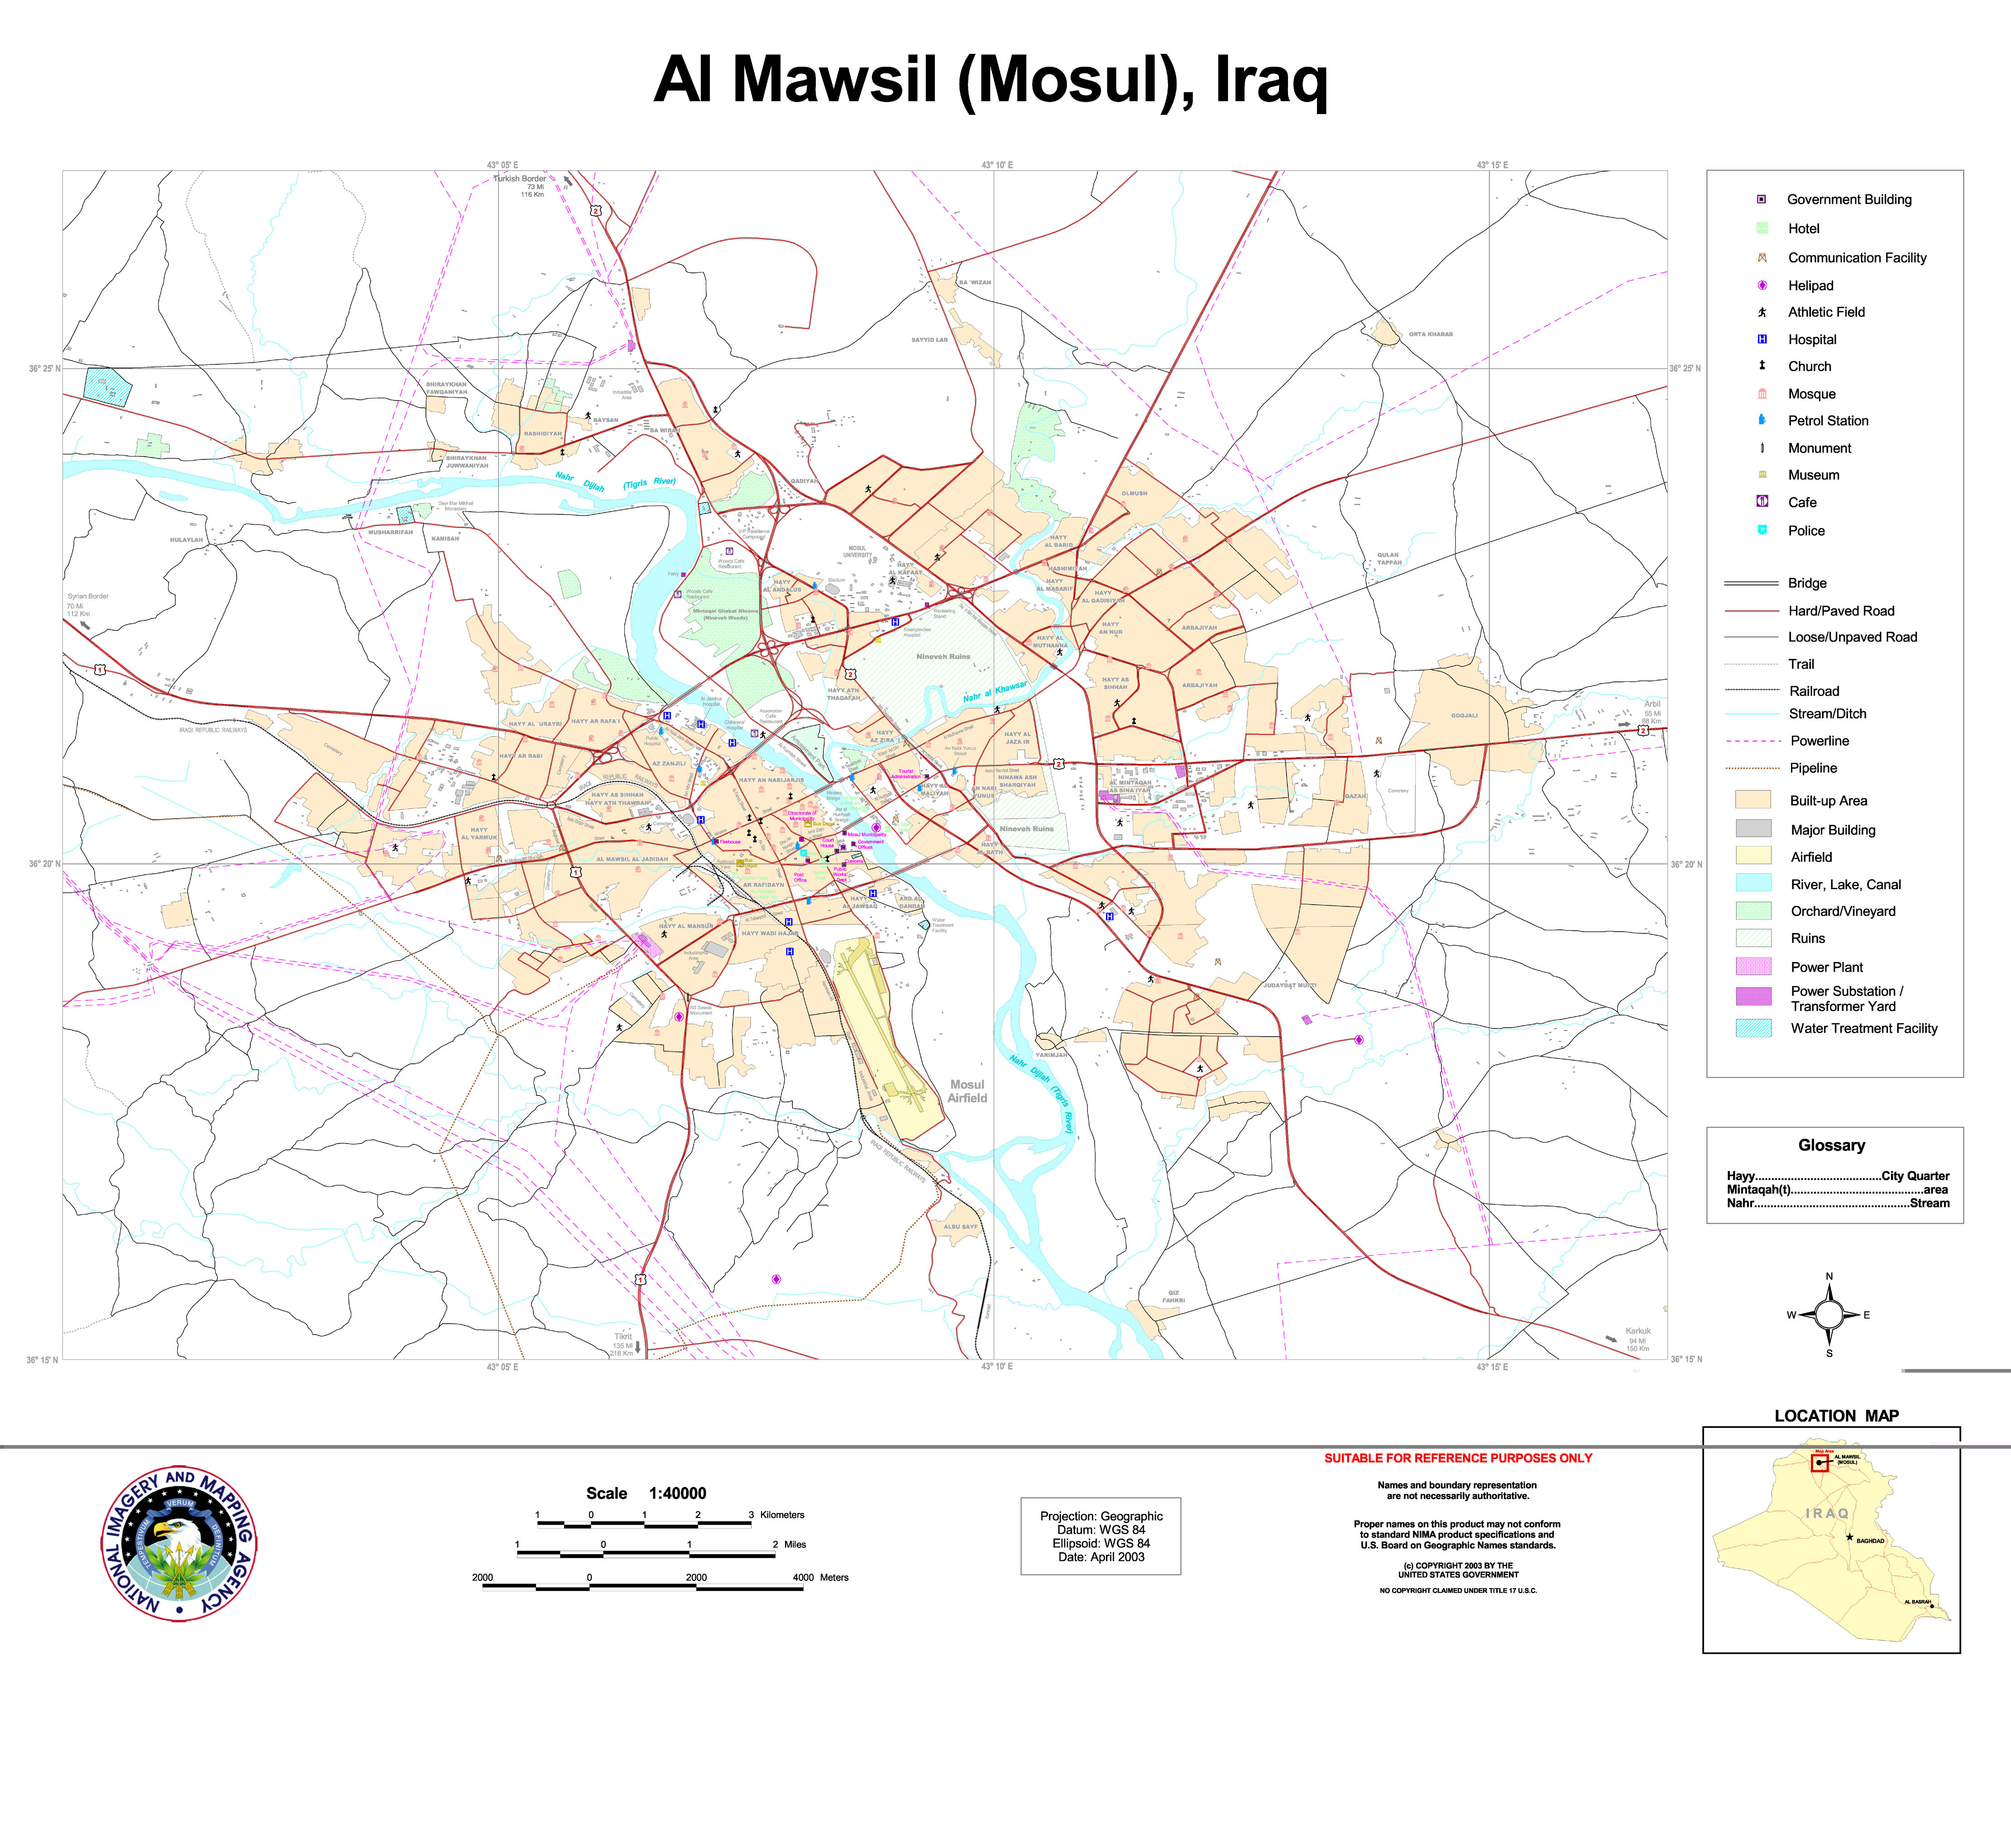 Mapa de Mosul 2003